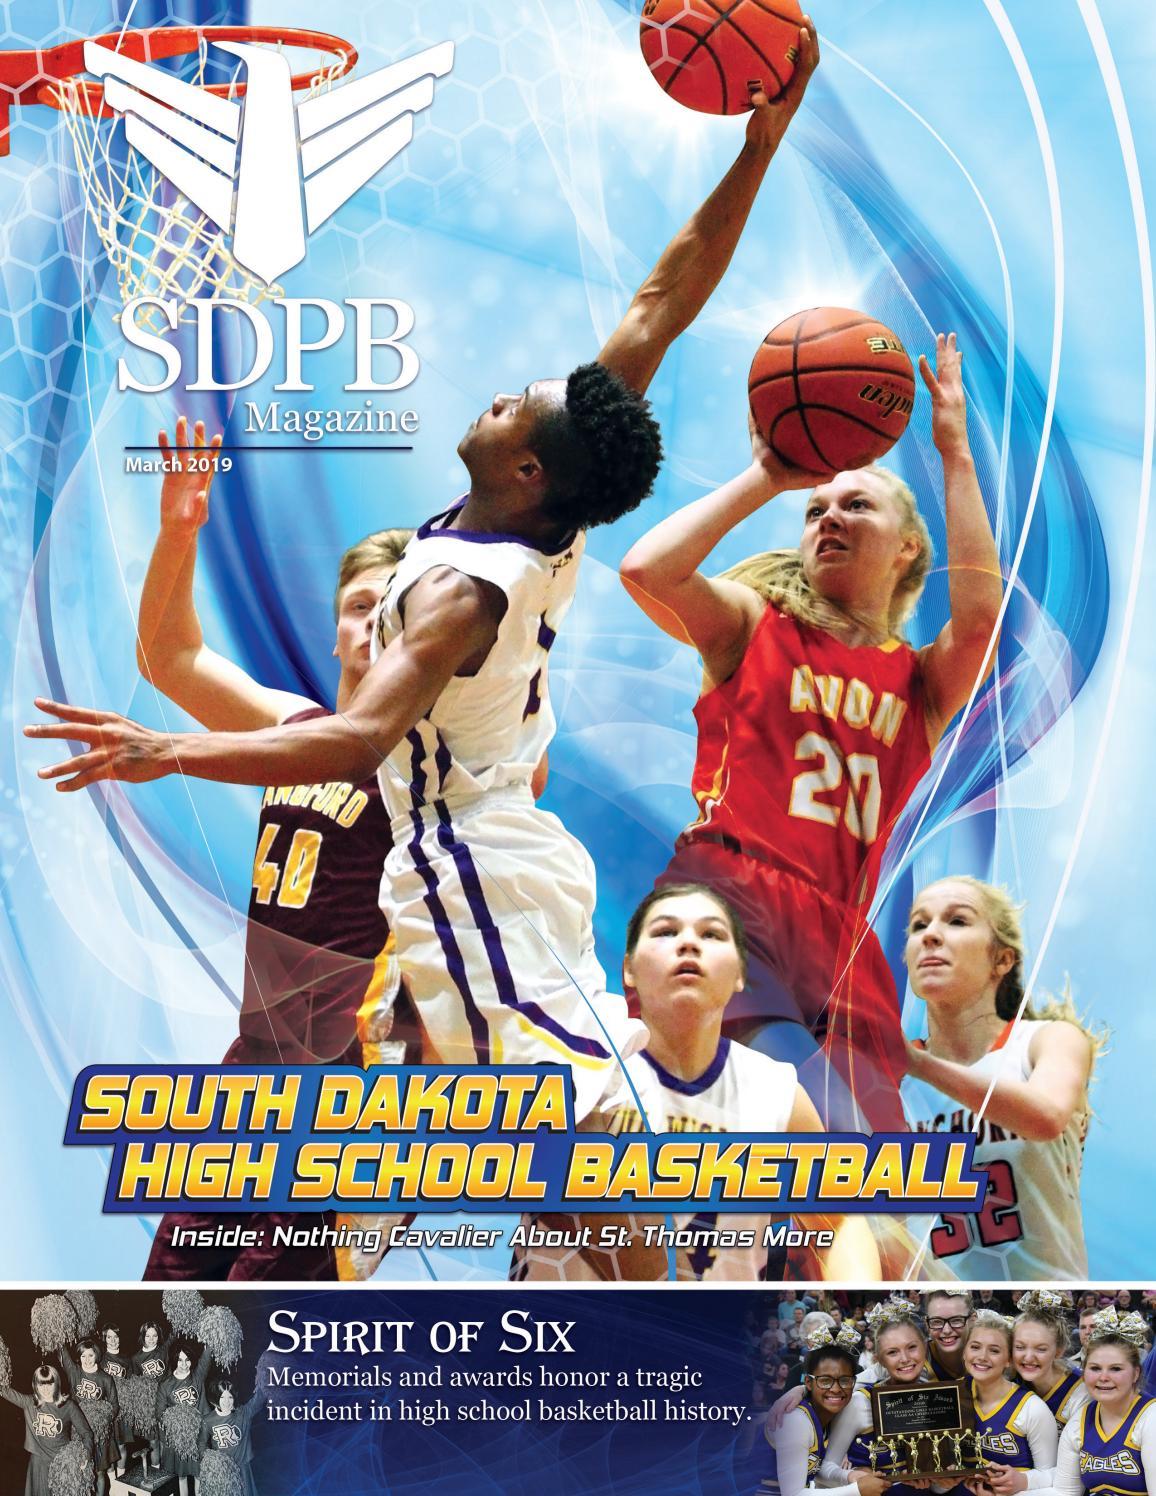 SDPB March 2019 Magazine by South Dakota Public Broadcasting